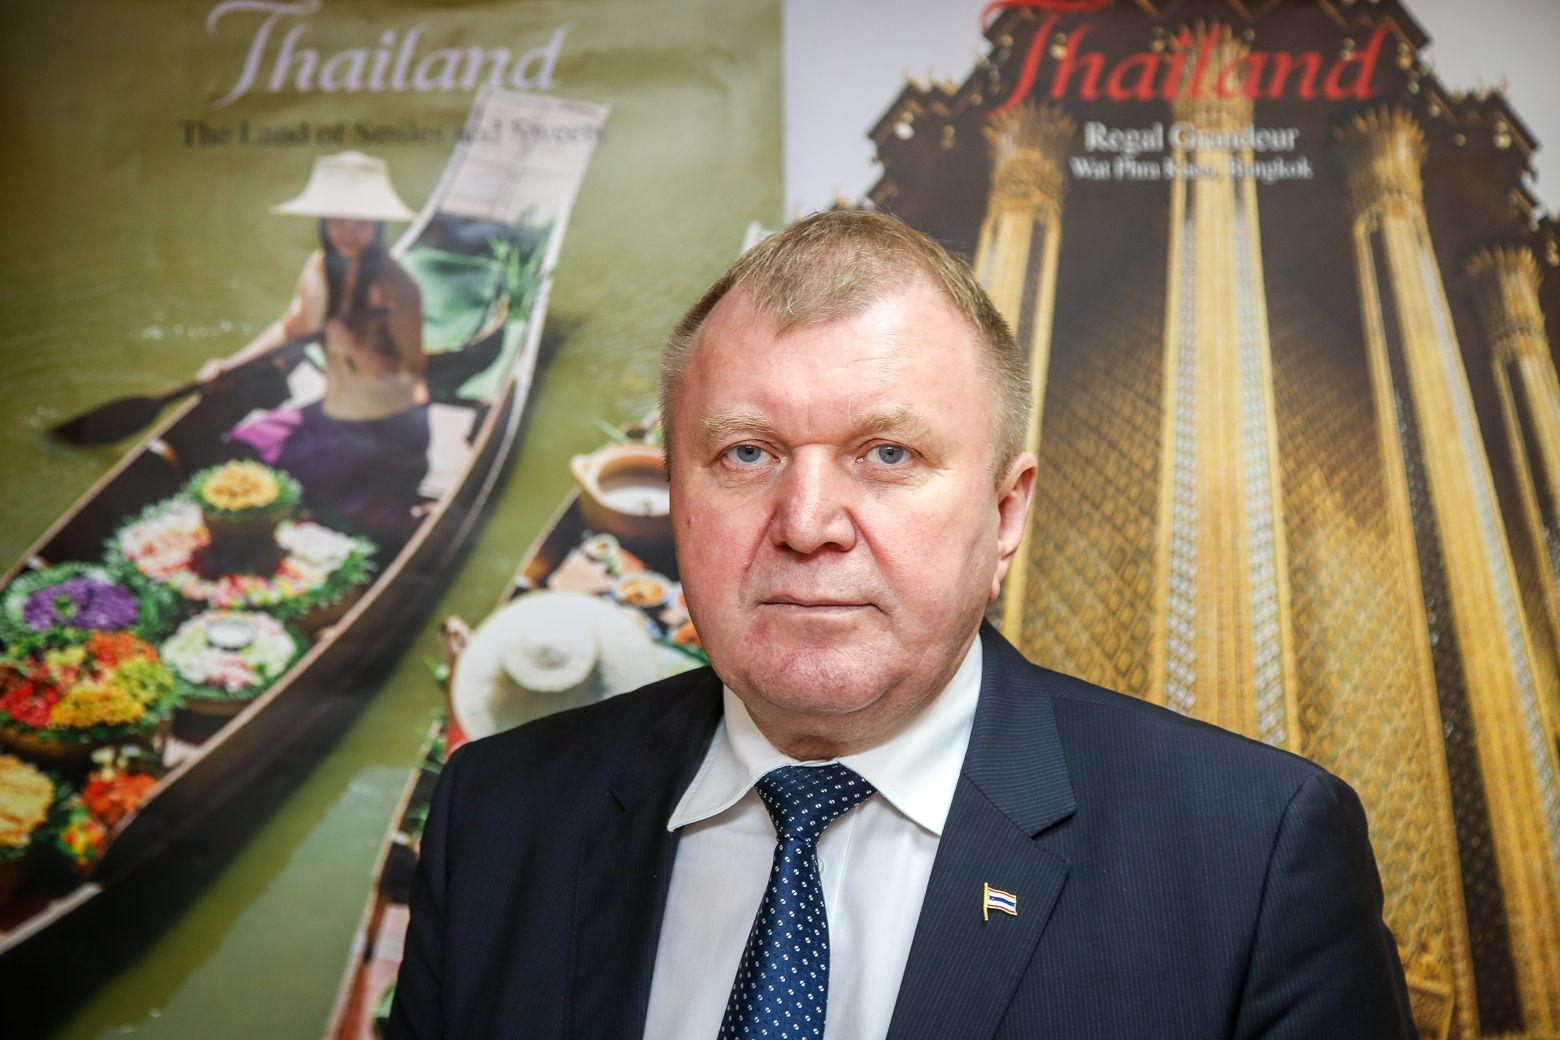 Почетный консул Таиланда в Беларуси Иван Чура